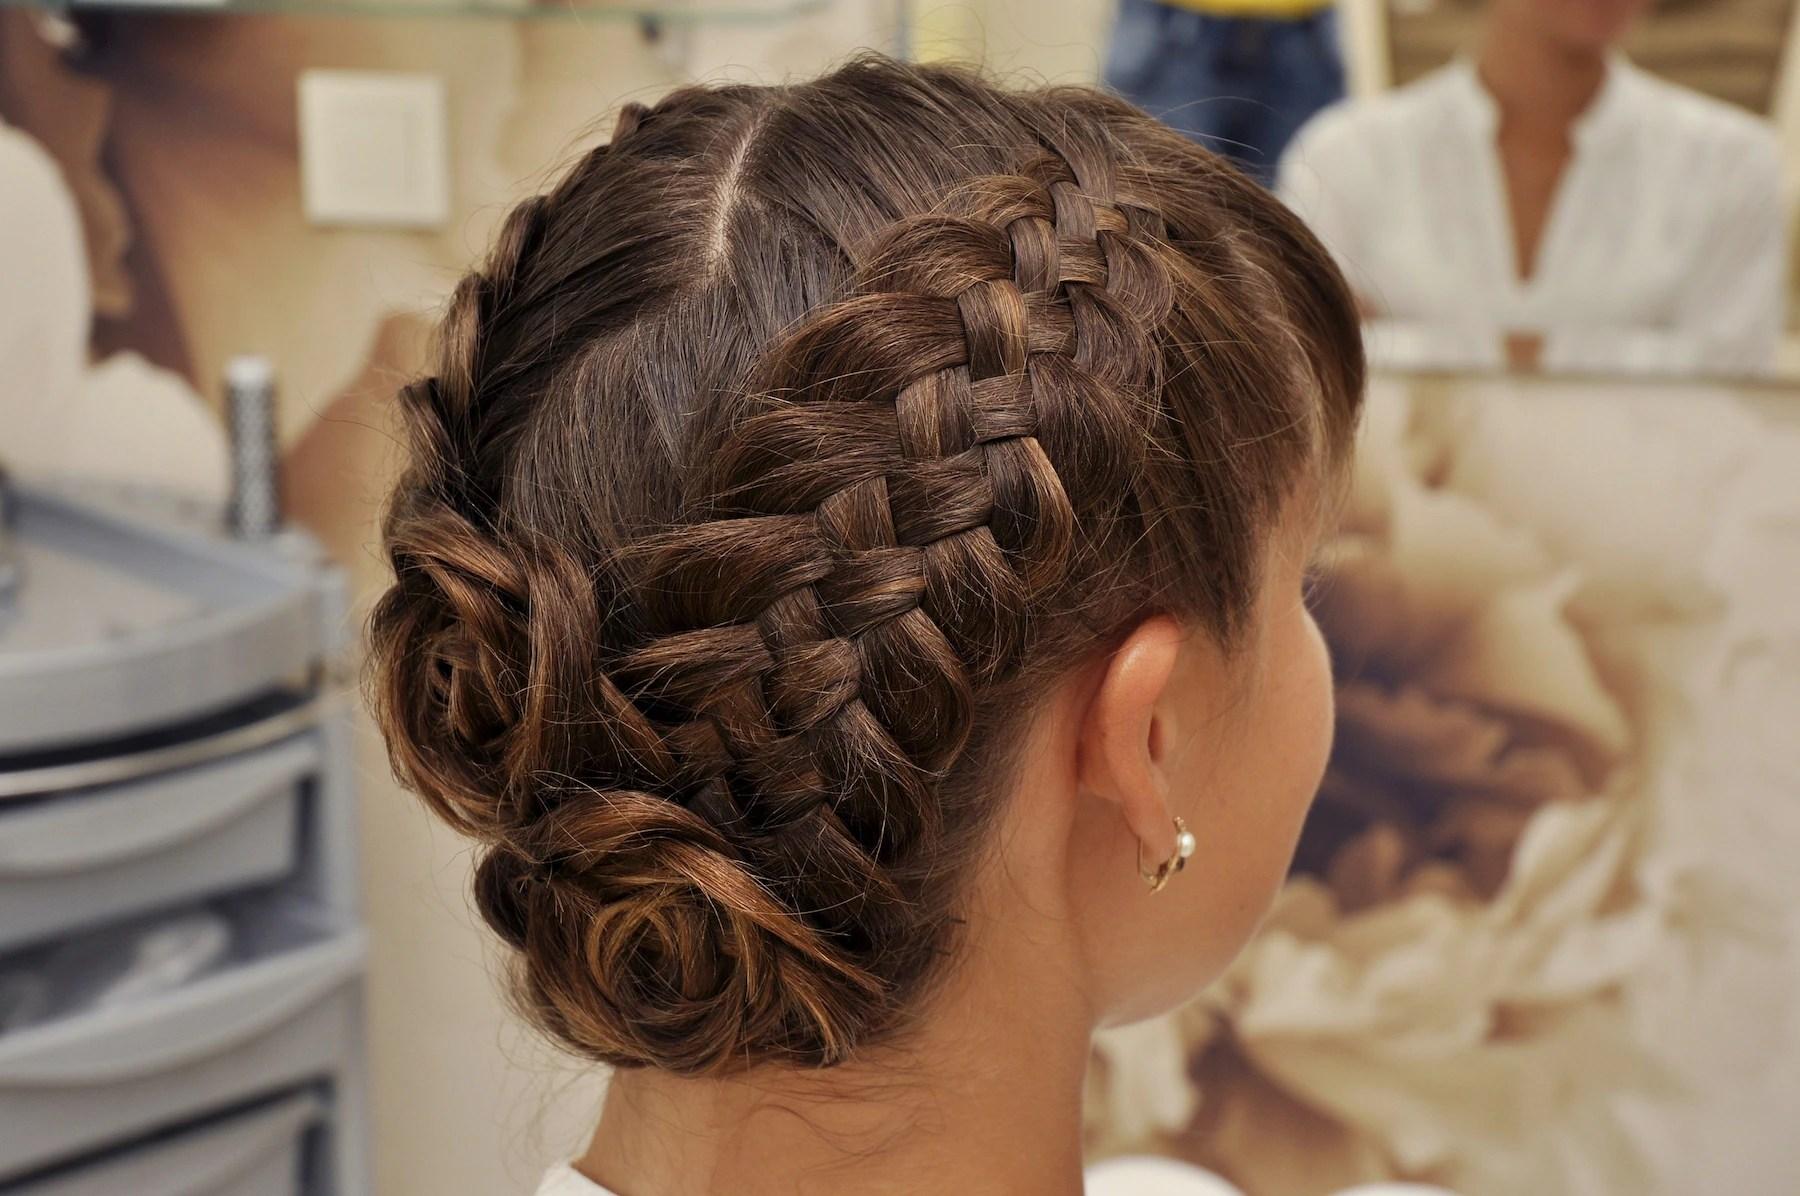 19 Cara Mengepang Rambut Ini Patut Dicoba All Things Hair Indonesia